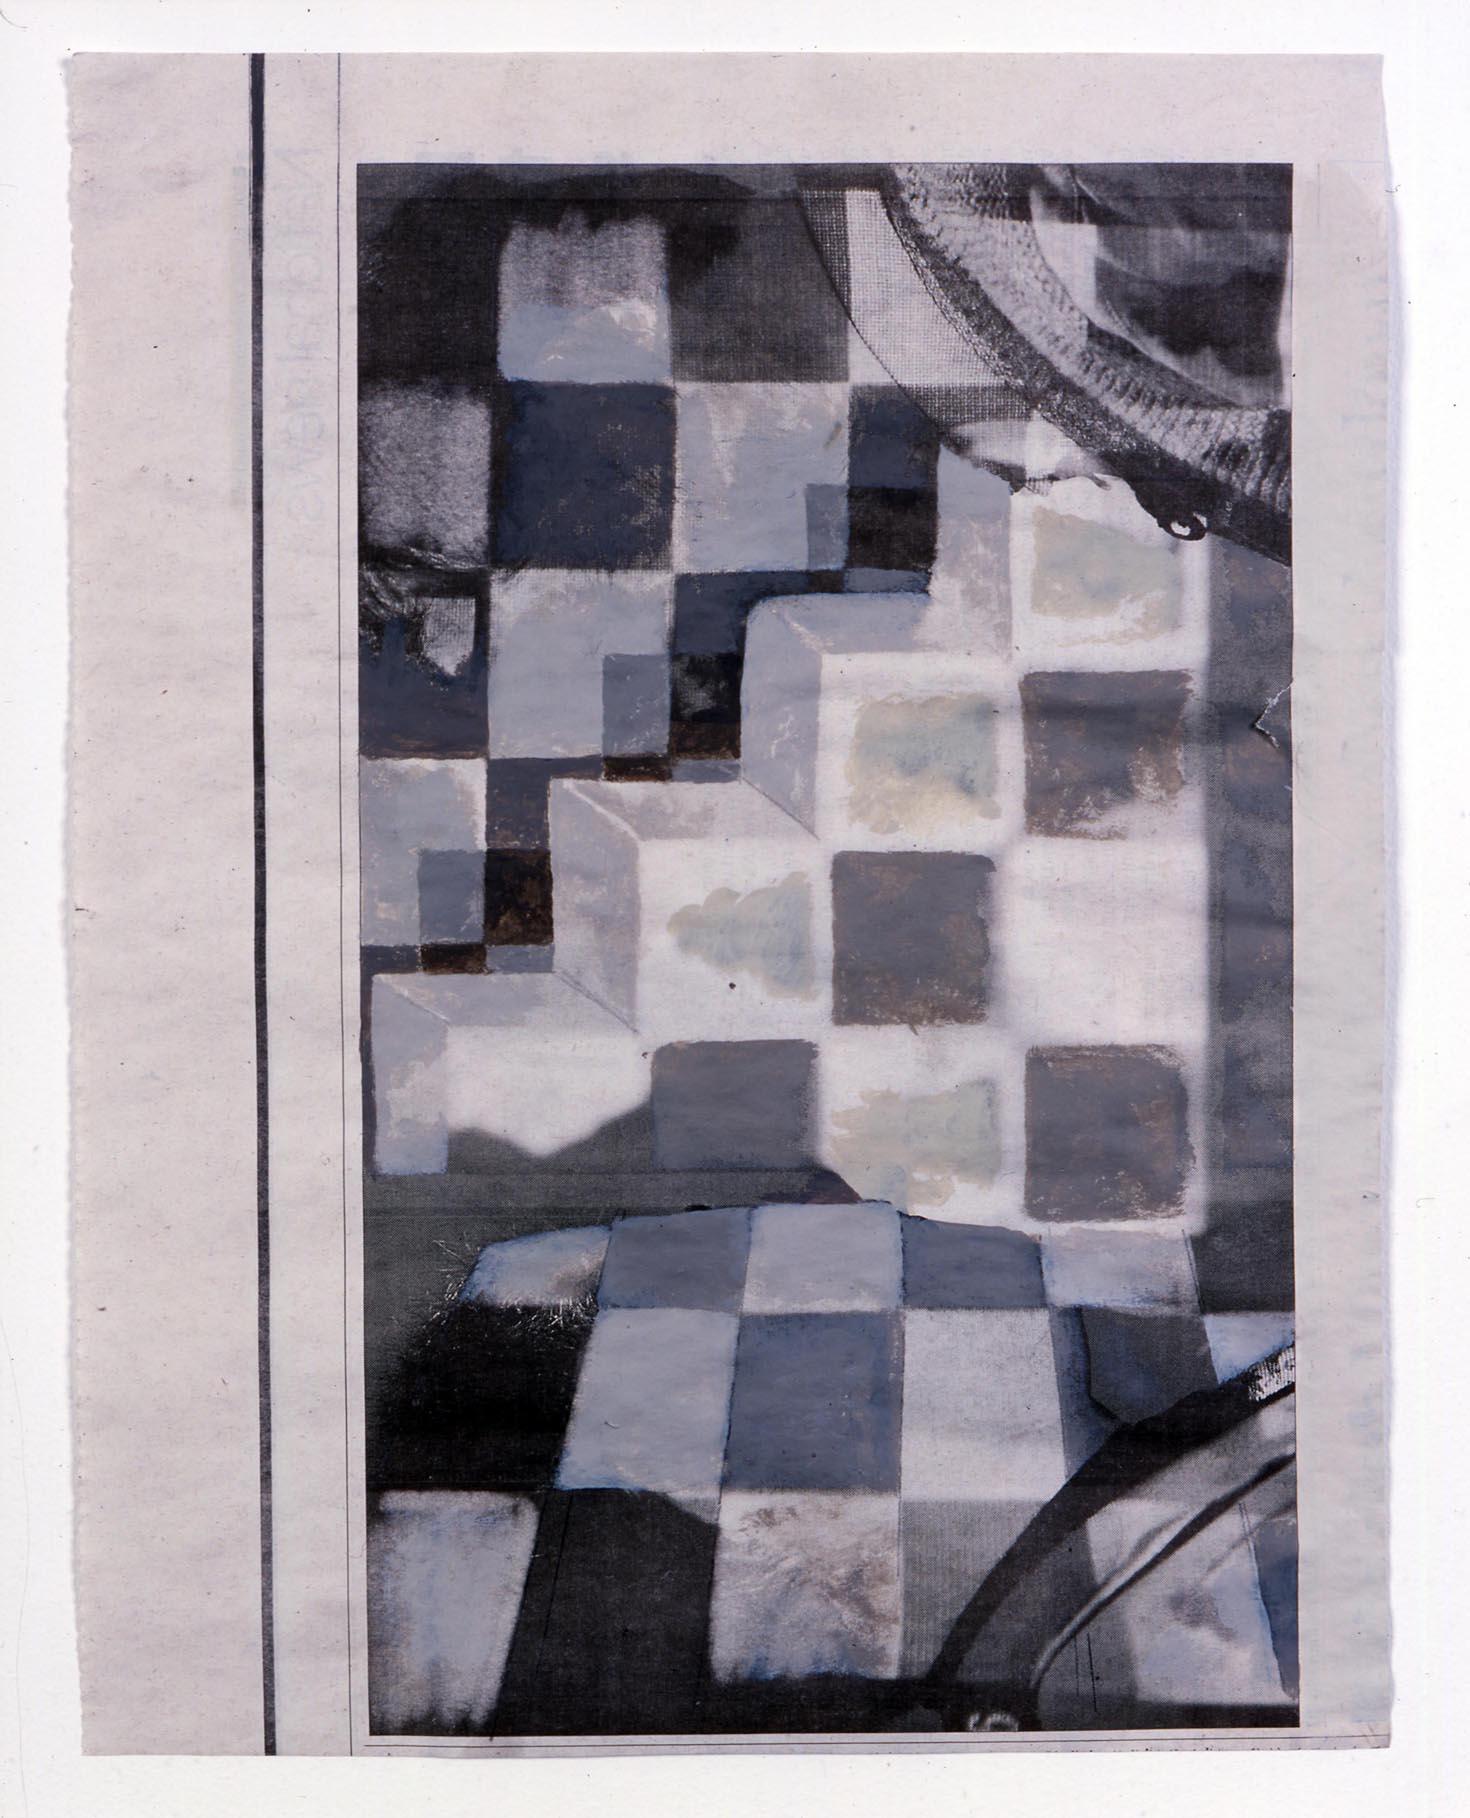 Started by Dark 2005 Acrylic on newsprint 27.3 x 21cm